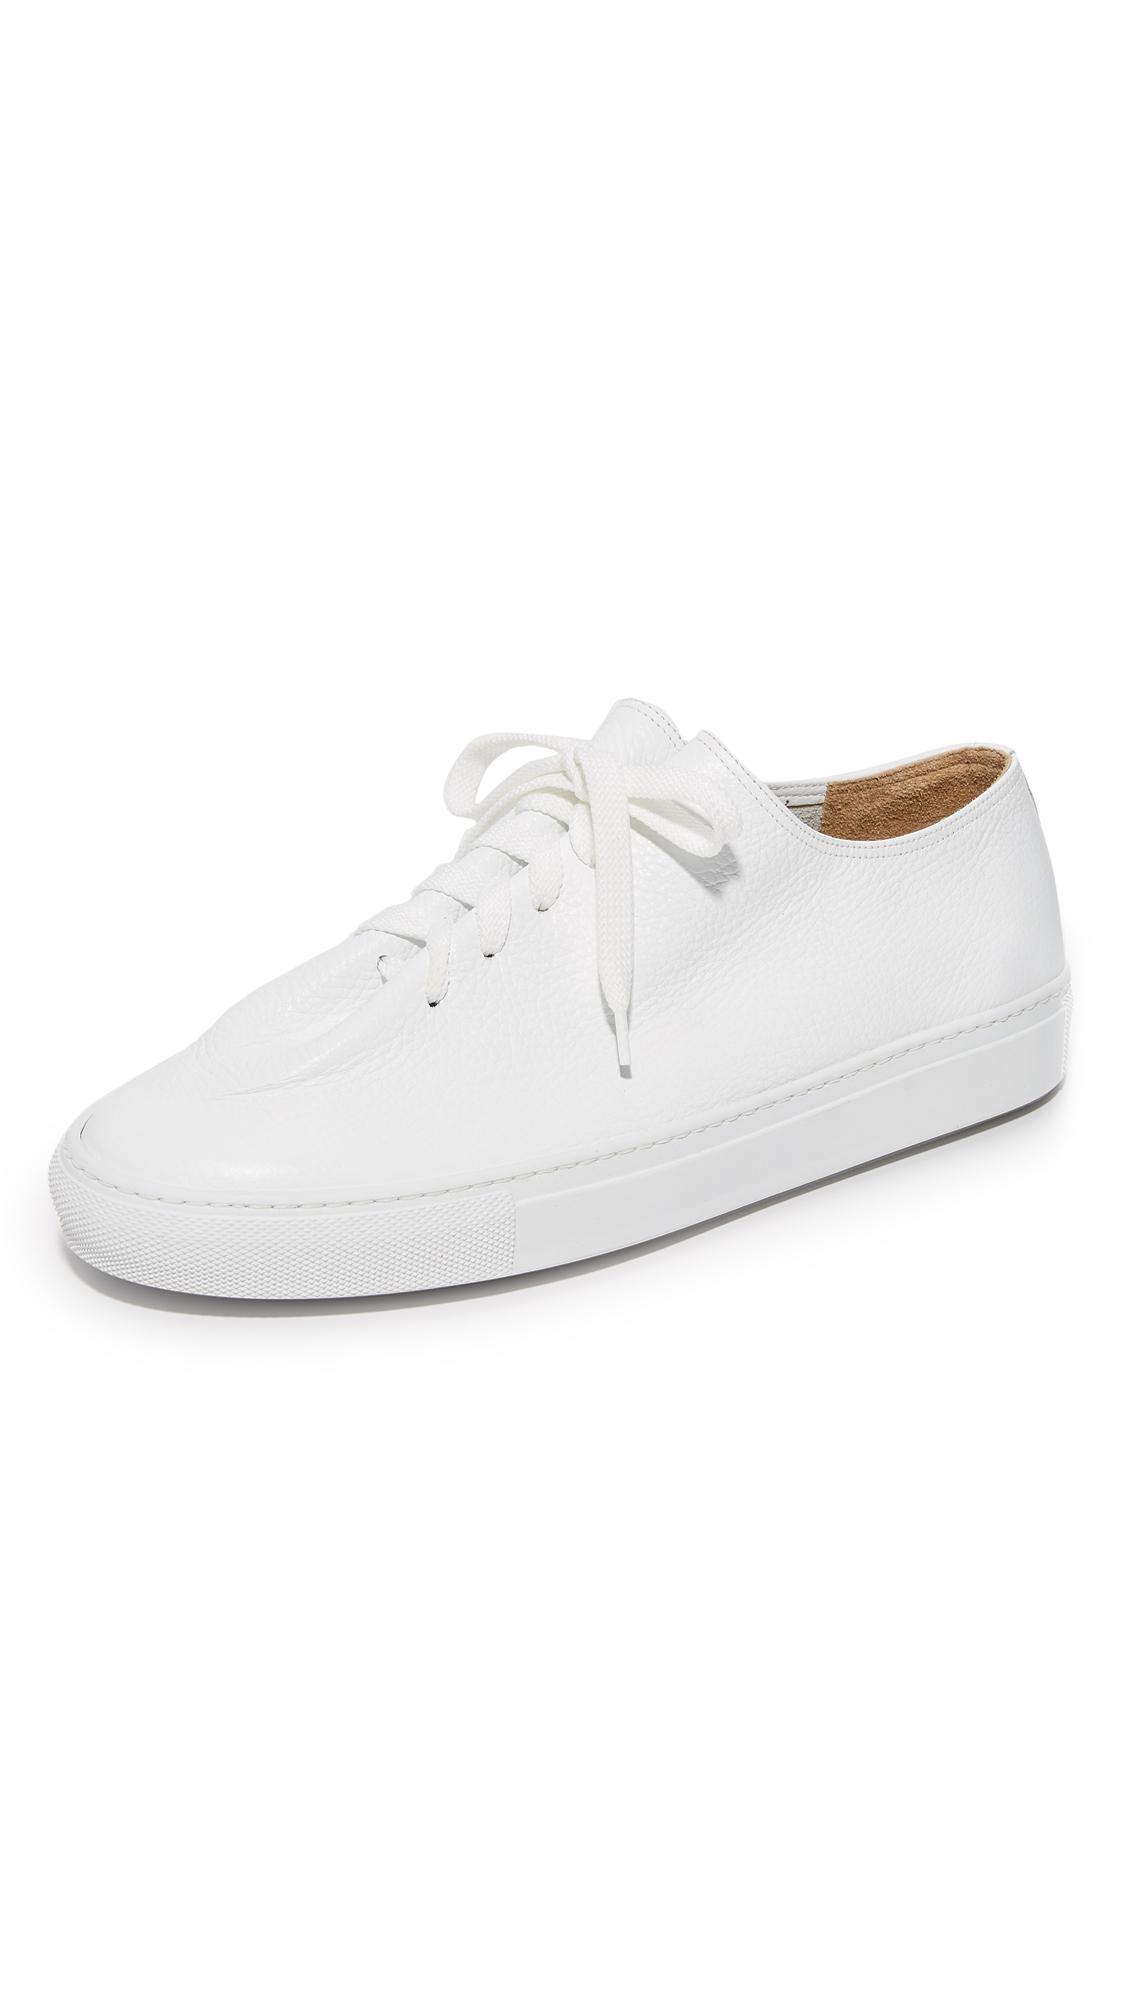 FOOTWEAR - Low-tops & sneakers Solovière uT9MjG5